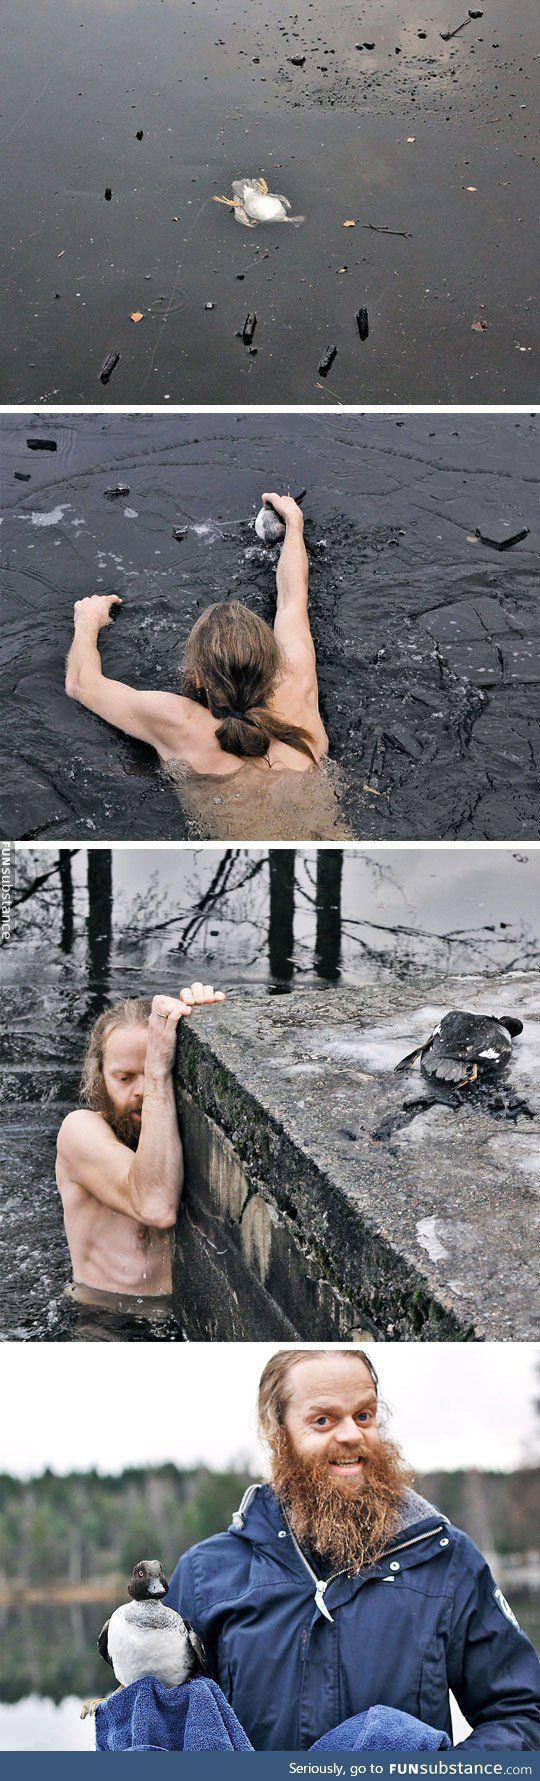 Norwegian man saves a duck – Kate Groner